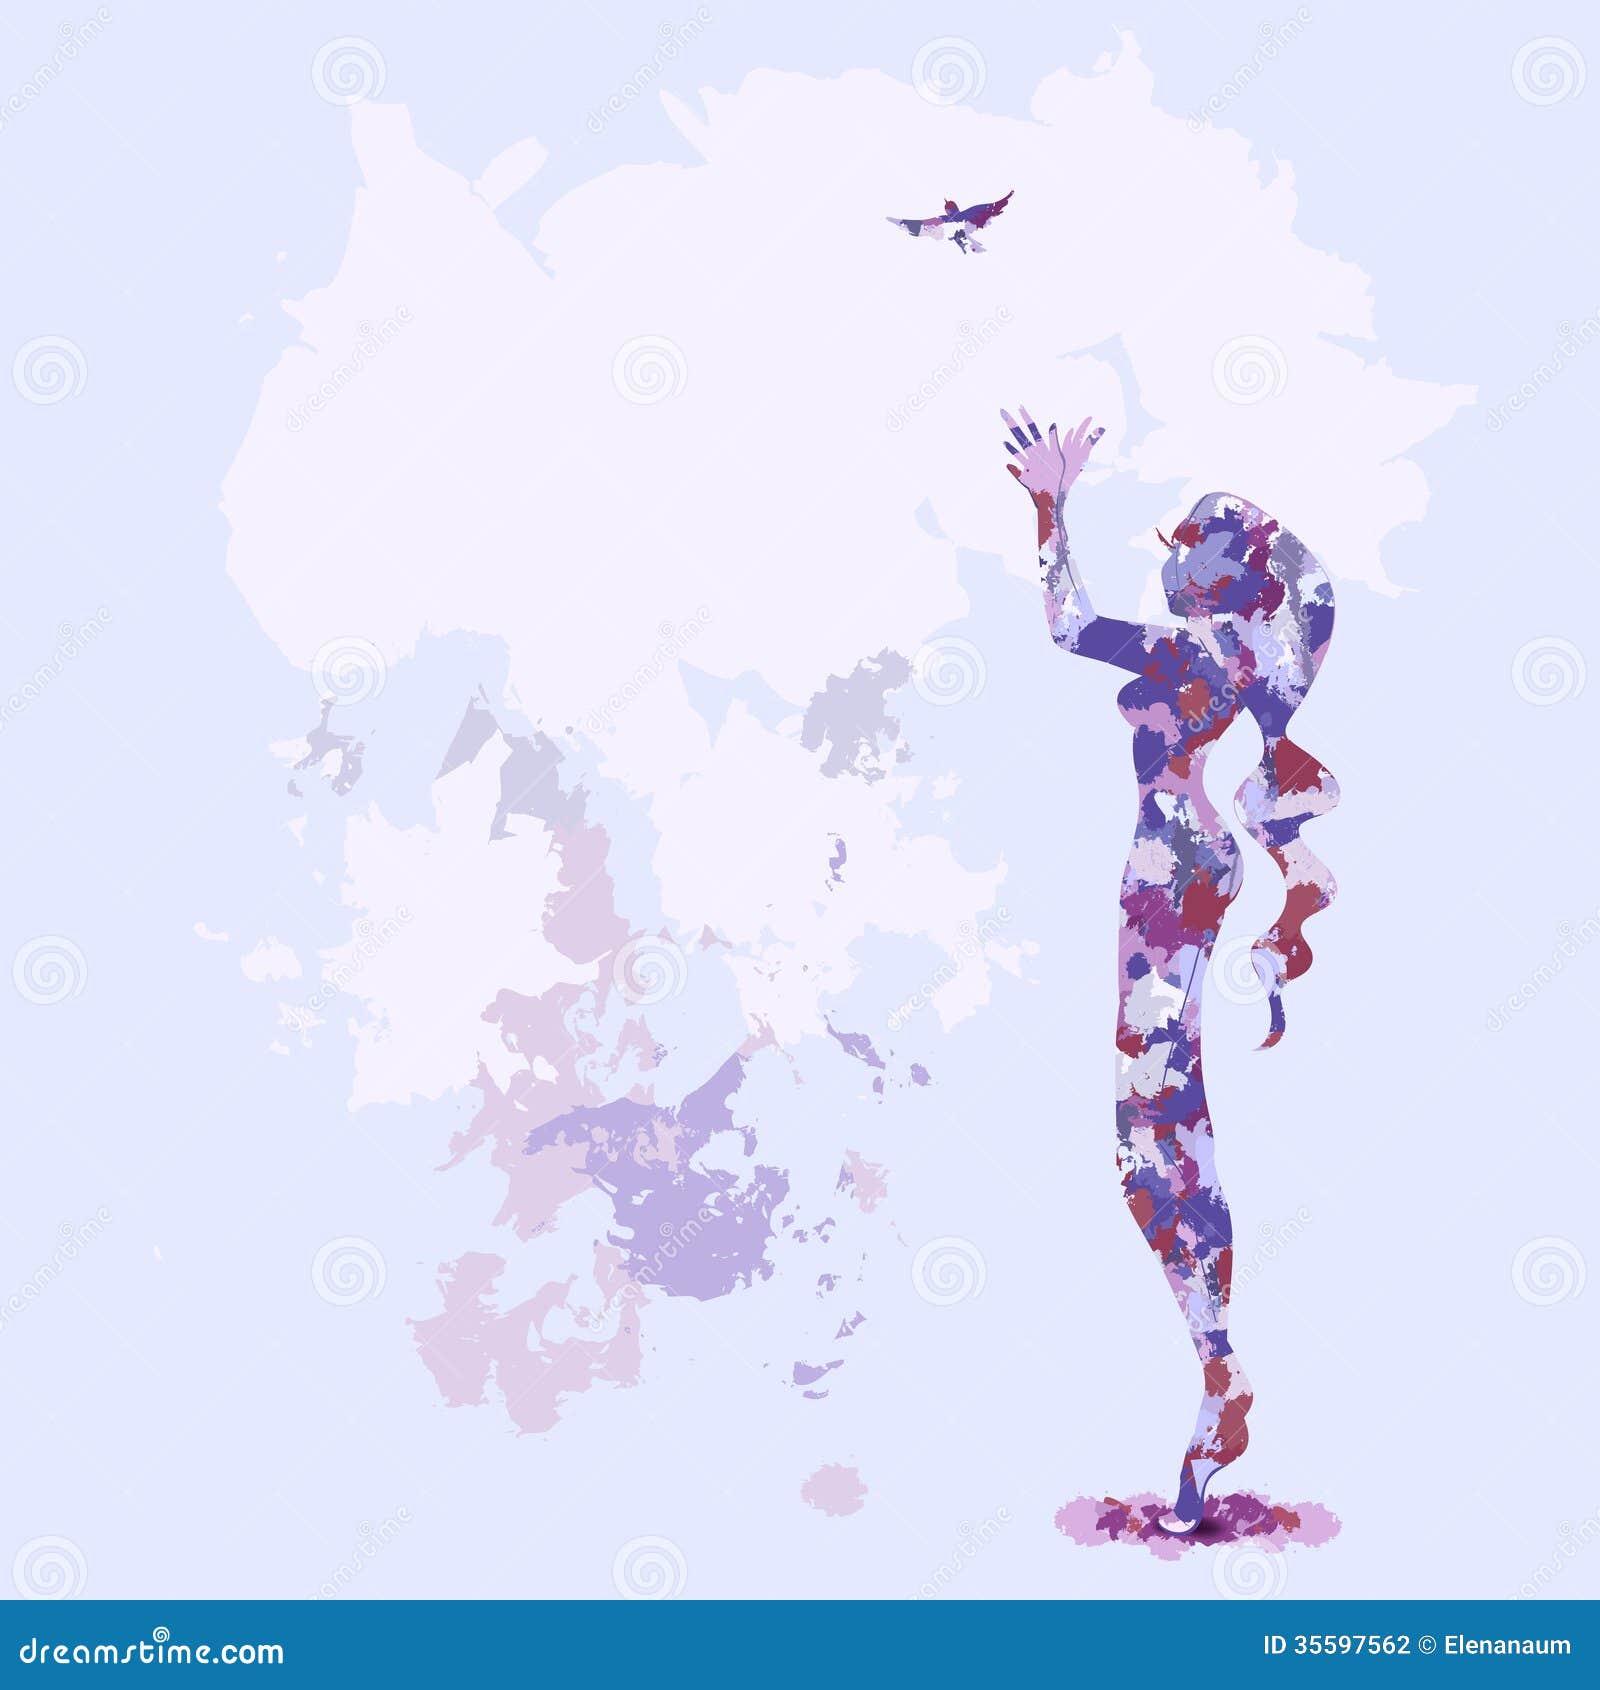 watercolor bird silhouette